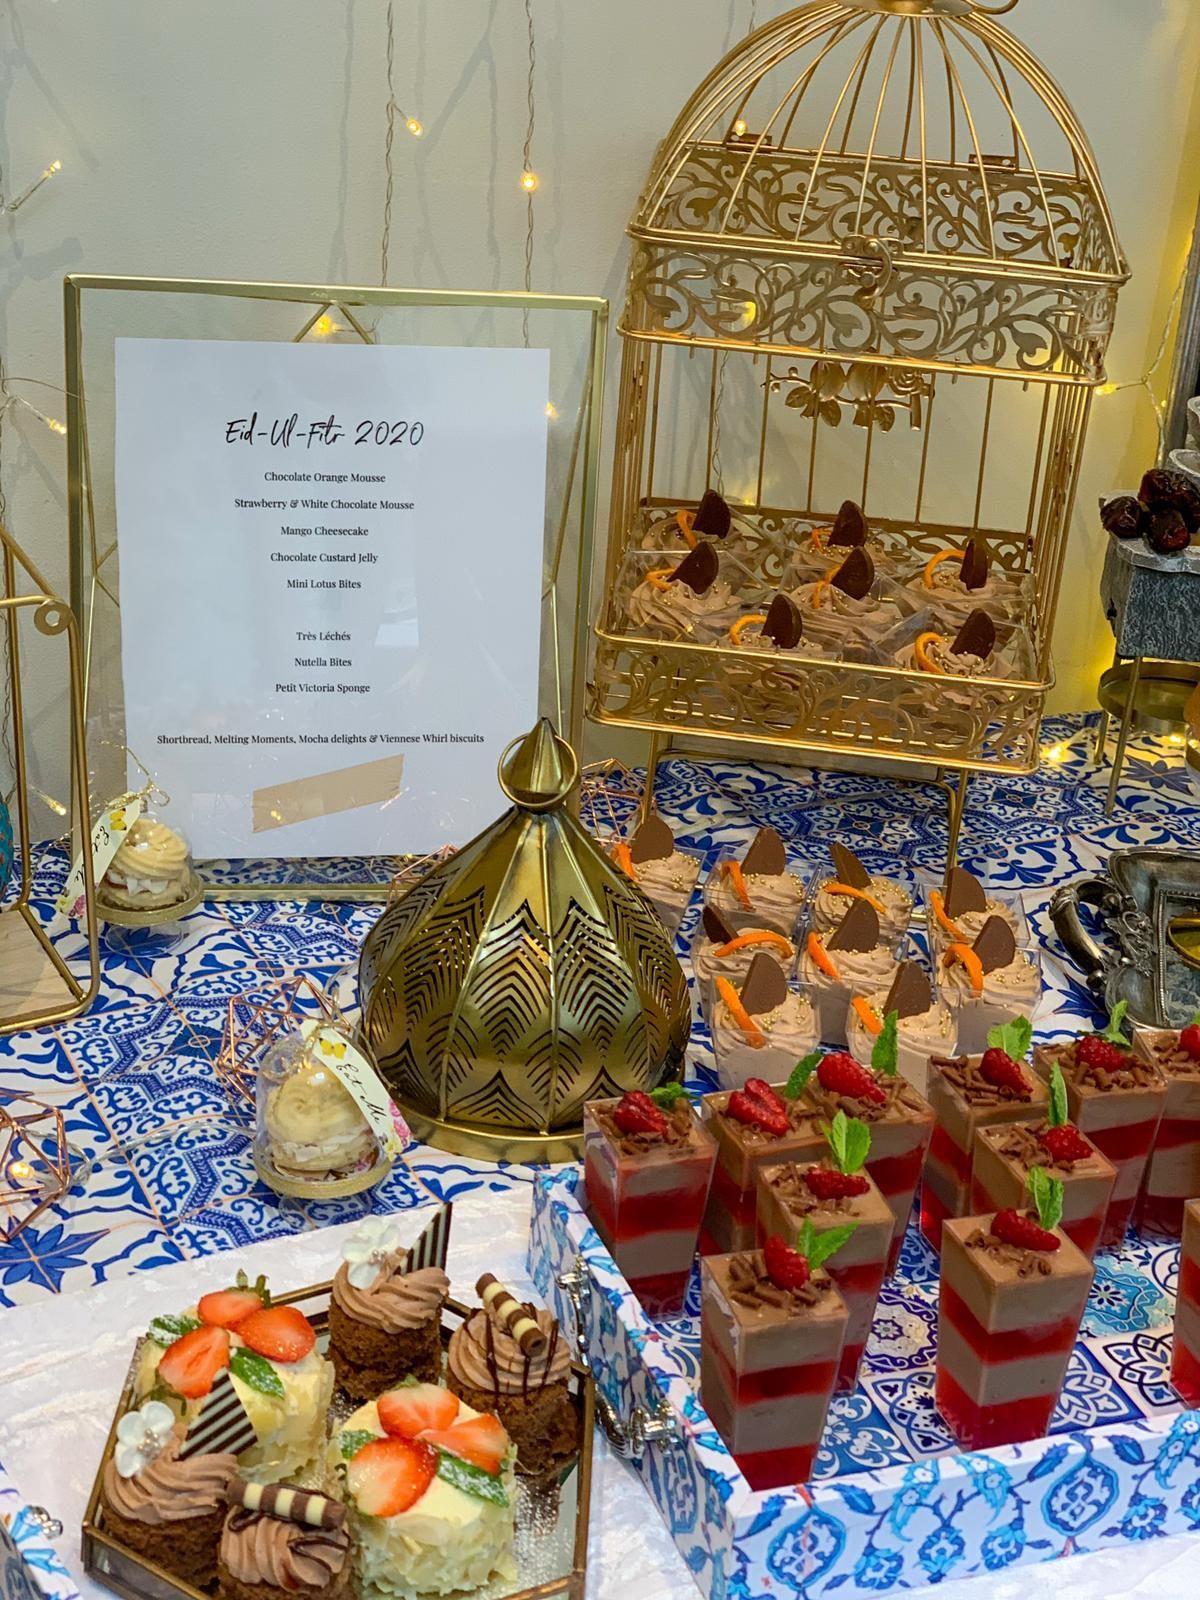 Www Eidparty Co Uk Ramadan Decorations Eid Decoration Eid Party